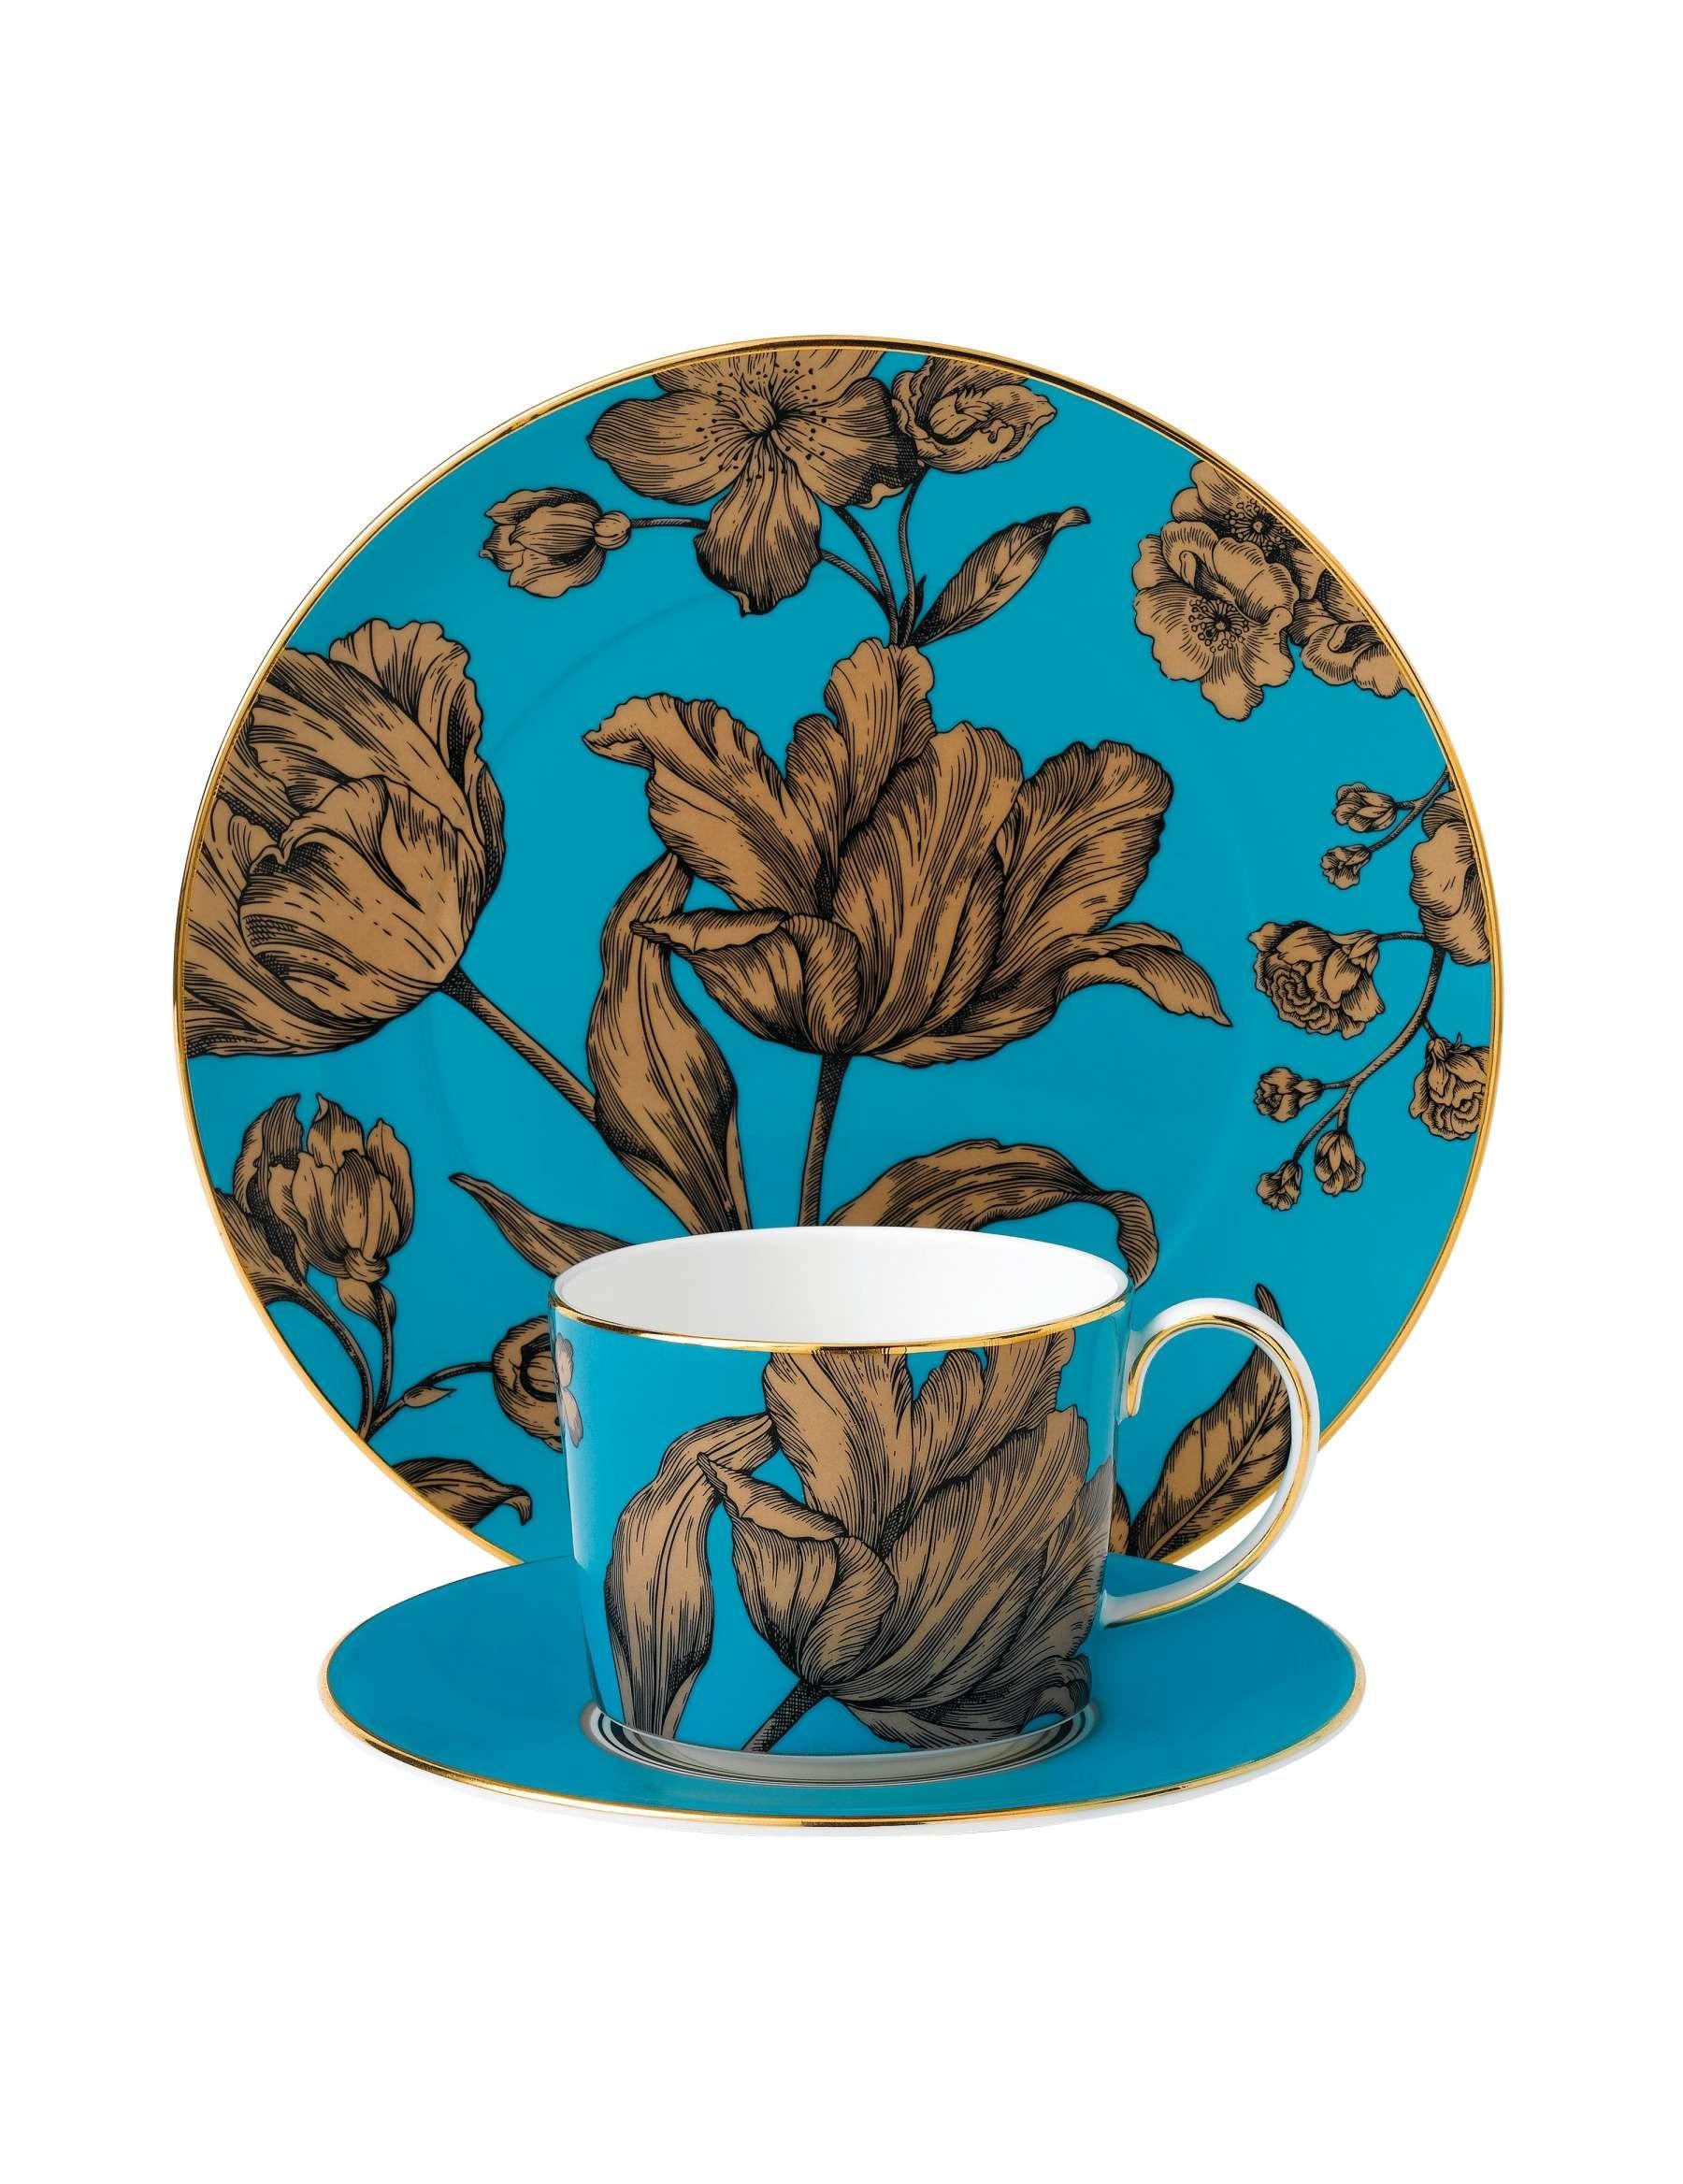 David Jones - Wedgwood Wedgwood Vibrance Turquoise 3 Piece Set  sc 1 st  Pinterest & David Jones - Wedgwood Wedgwood Vibrance Turquoise 3 Piece Set   Tea ...